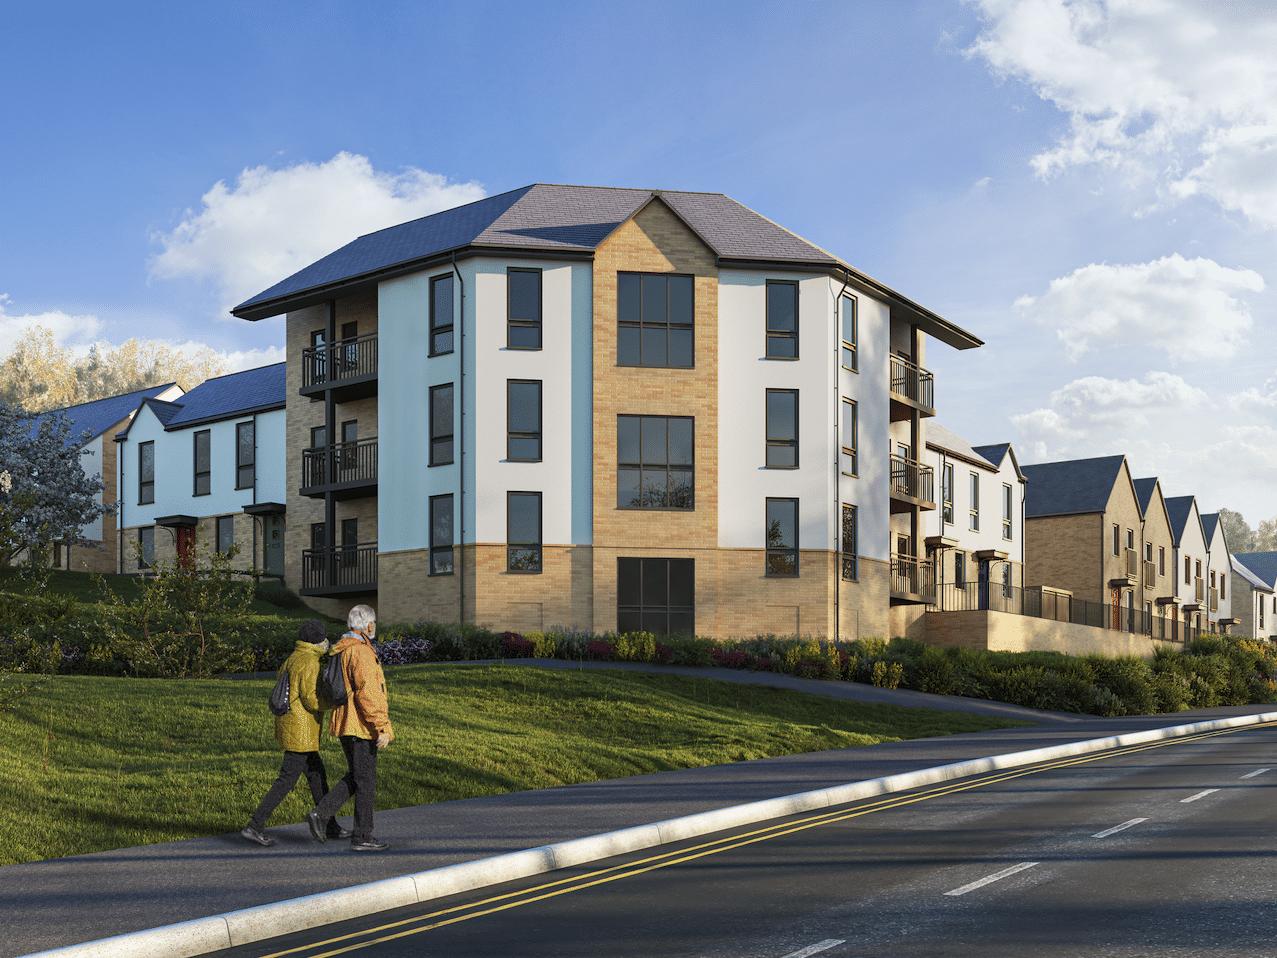 WMCA property funding brings forward 46 homes in telford.